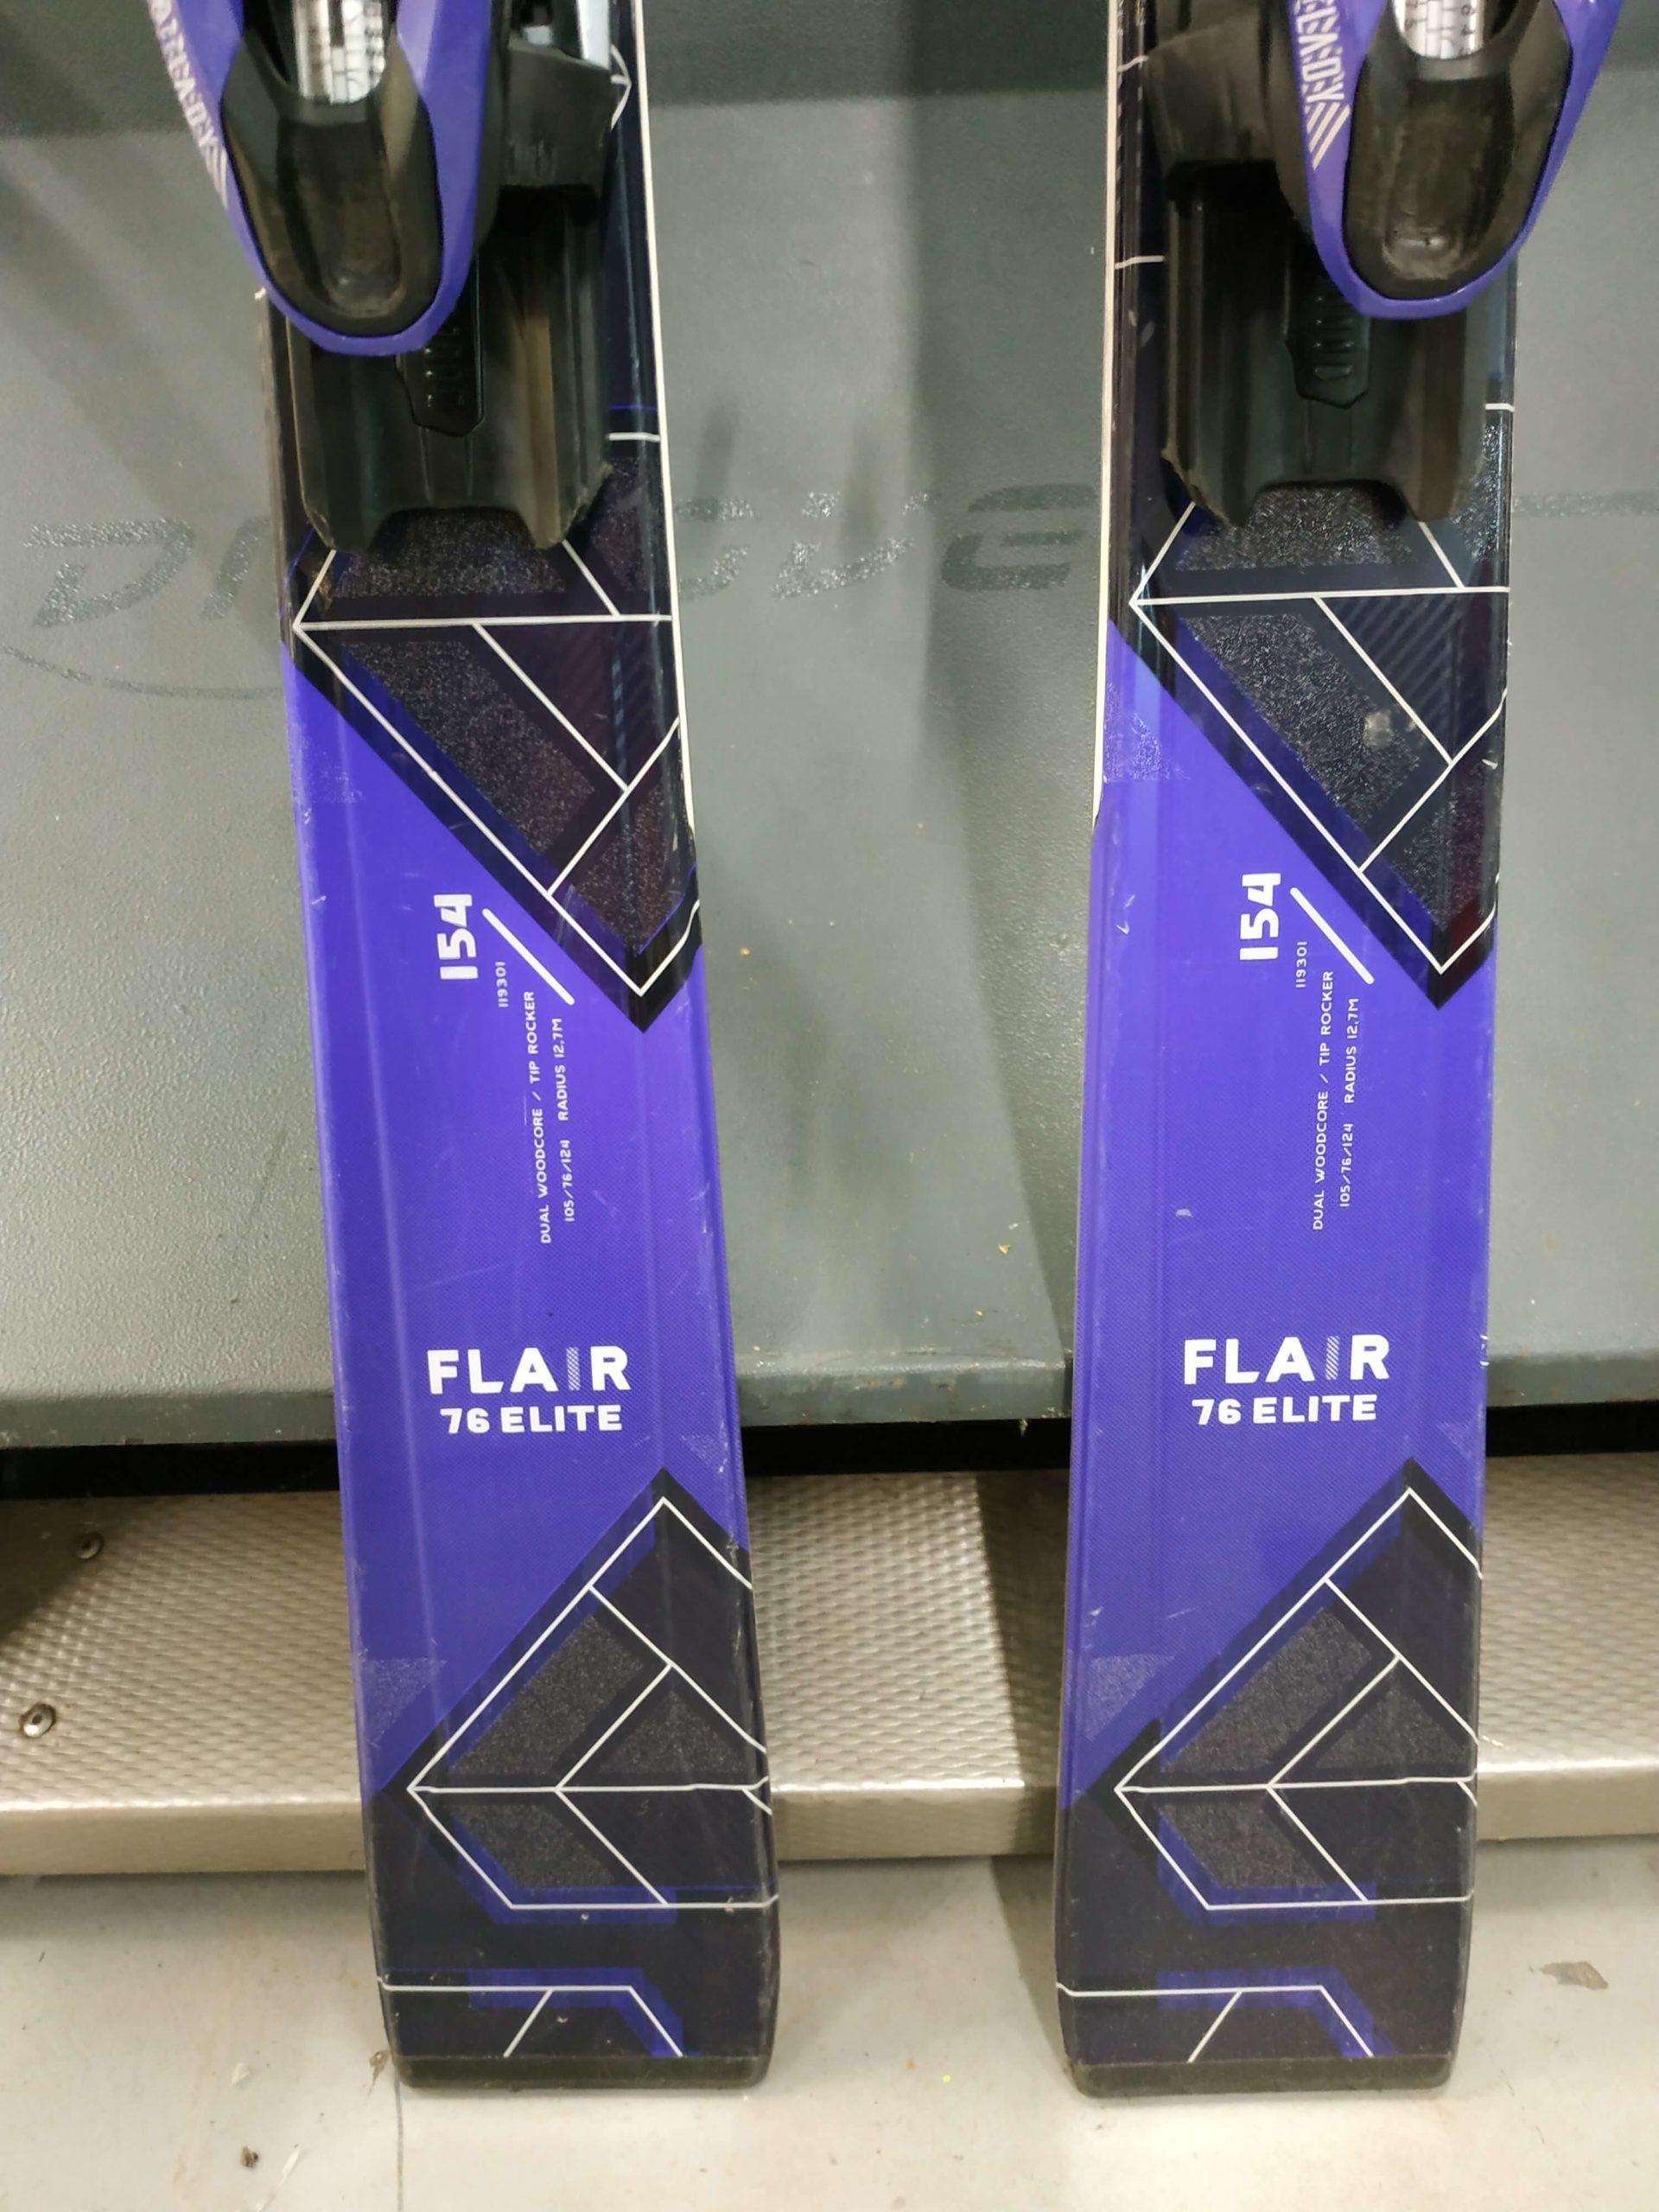 42. Volkl Flair 76 Elite 154 R12.7 (4)